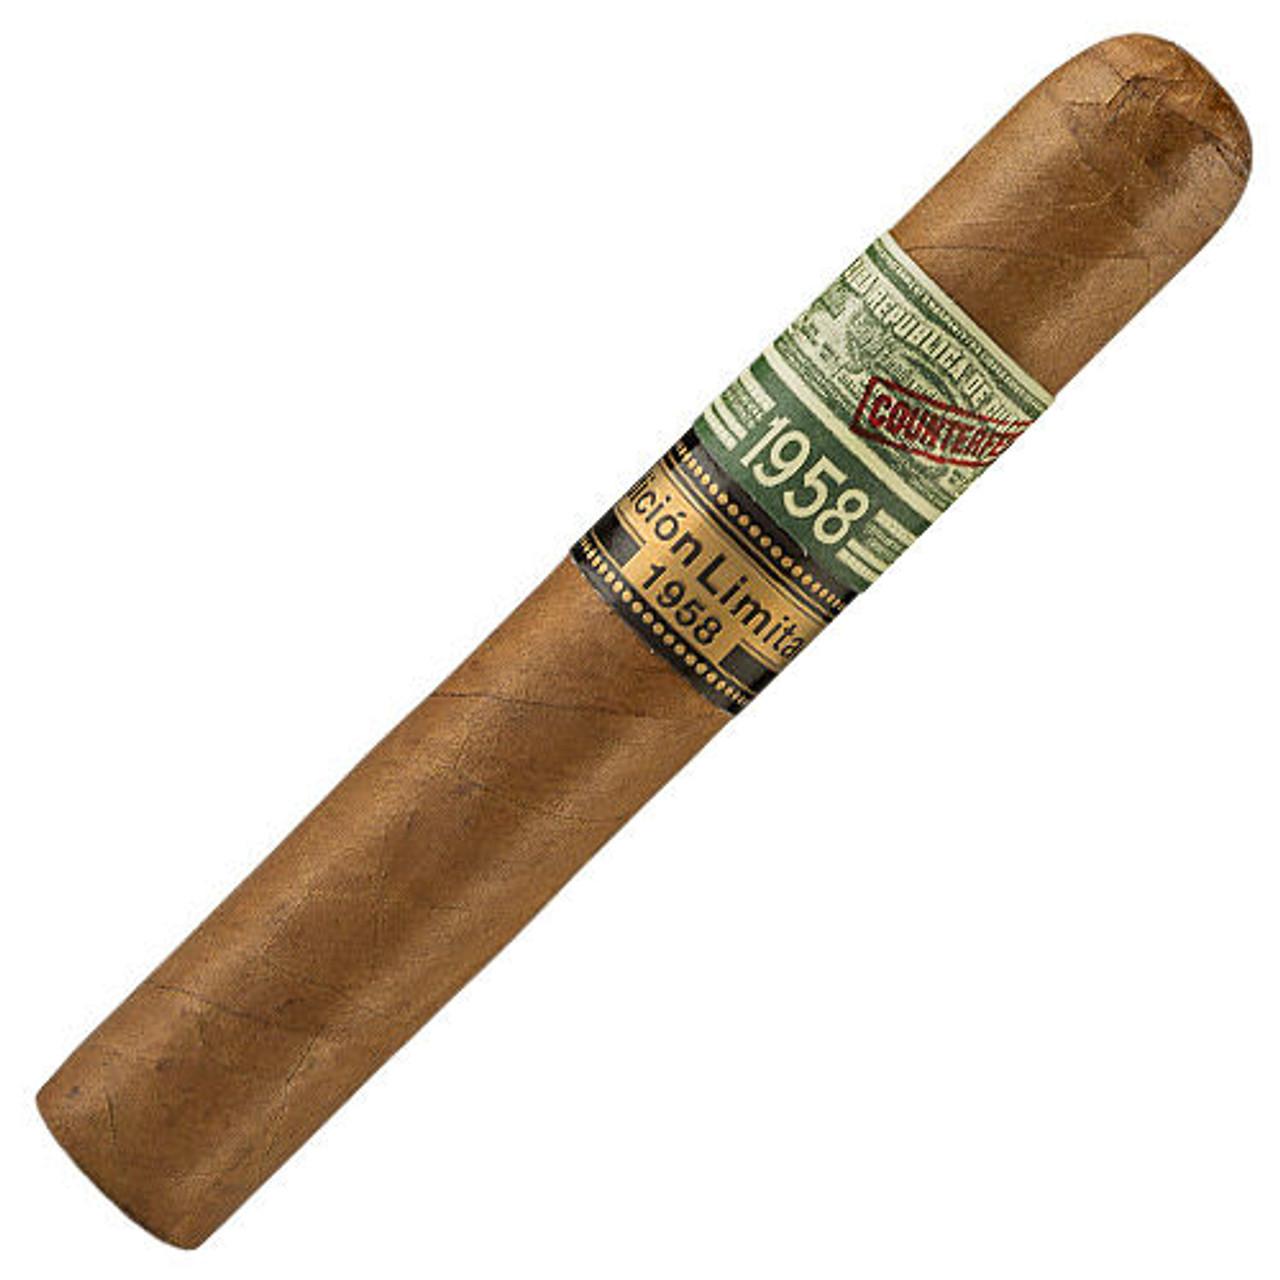 Genuine Pre-Embargo C.C. Sun Grown 1958 Epicure Cigars - 5.0 x 50 (Box of 25)